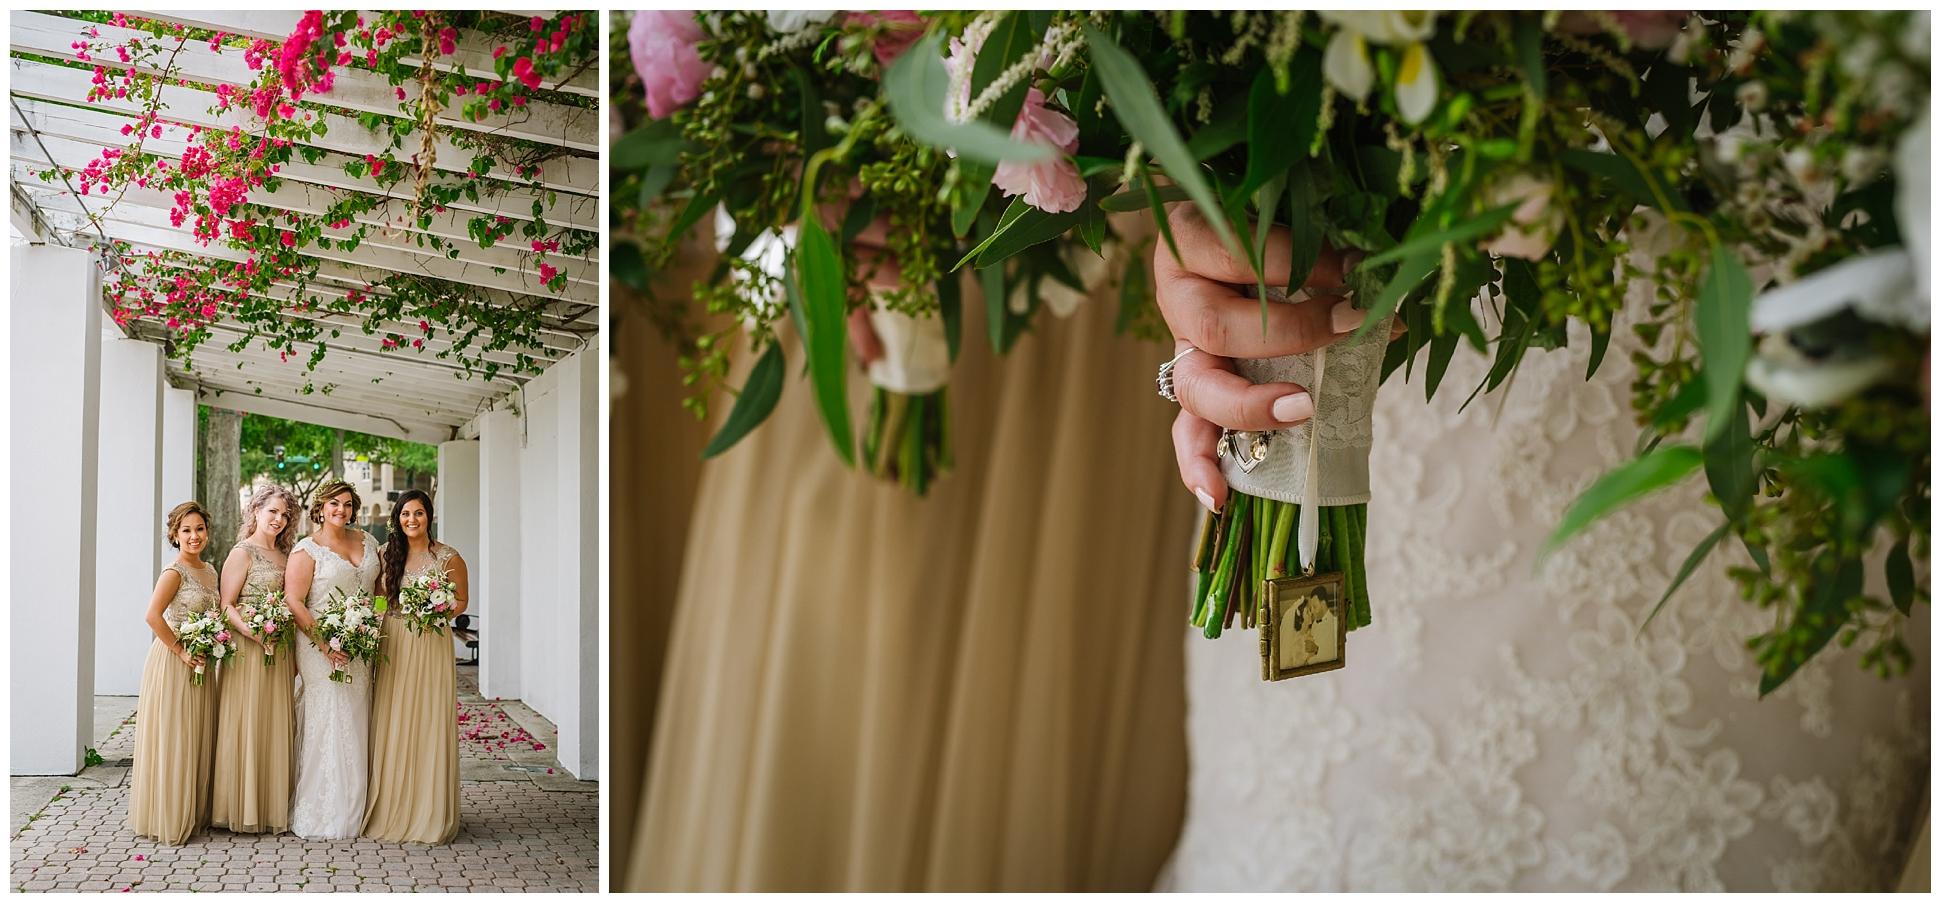 st-pete-wedding-photographer-italian-romance-theme-rustic-flower-crown_0420.jpg